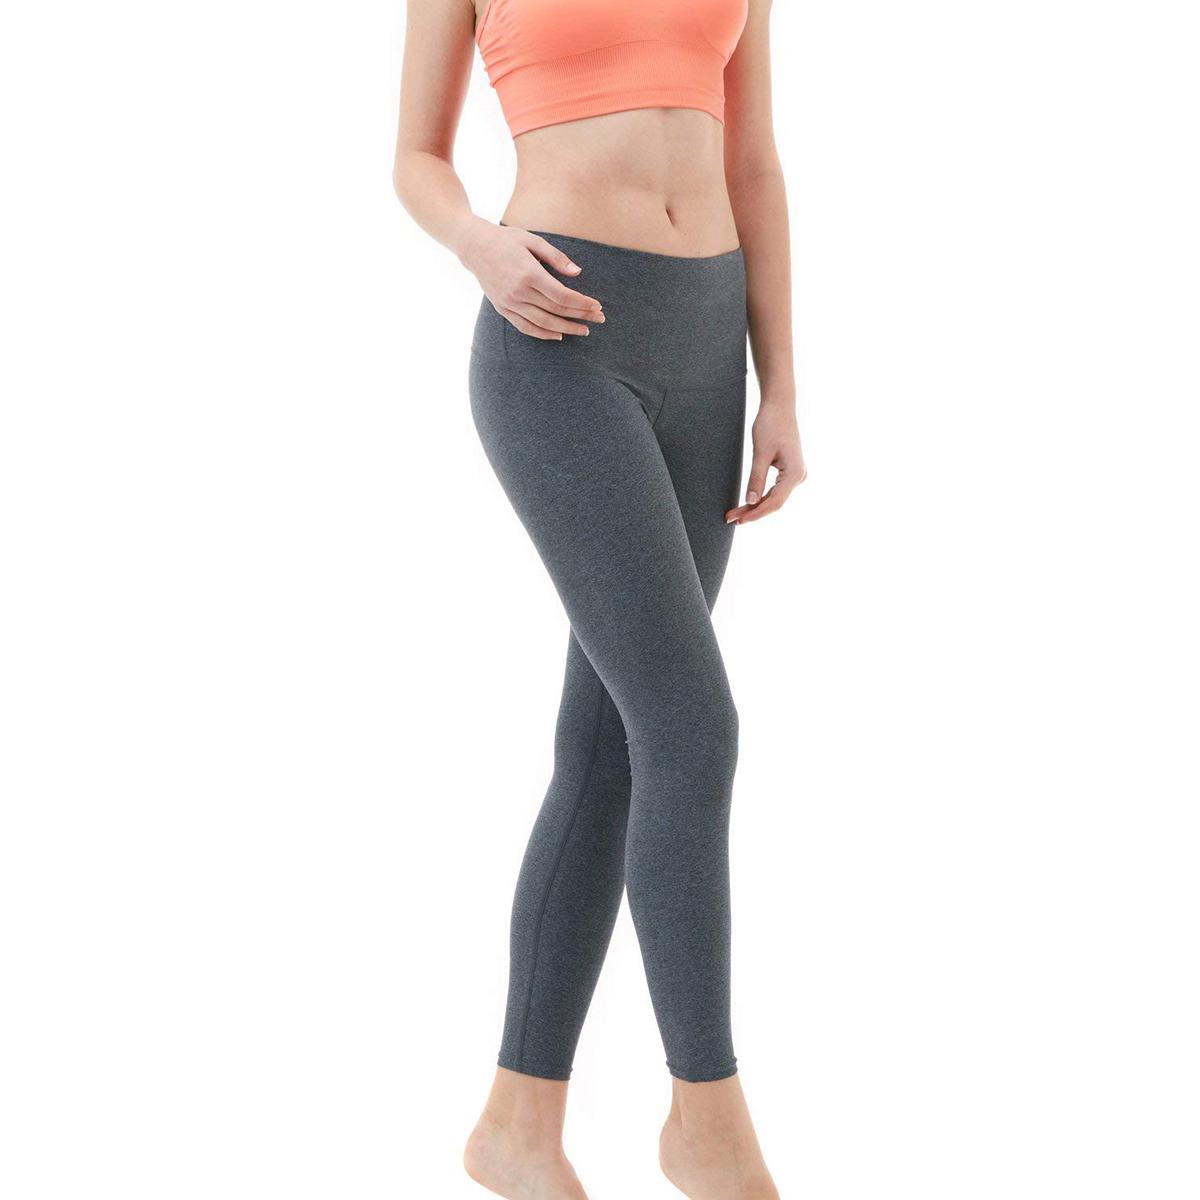 thumbnail 10 - TSLA Tesla FYP52 Women's High-Waisted Ultra-Stretch Tummy Control Yoga Pants